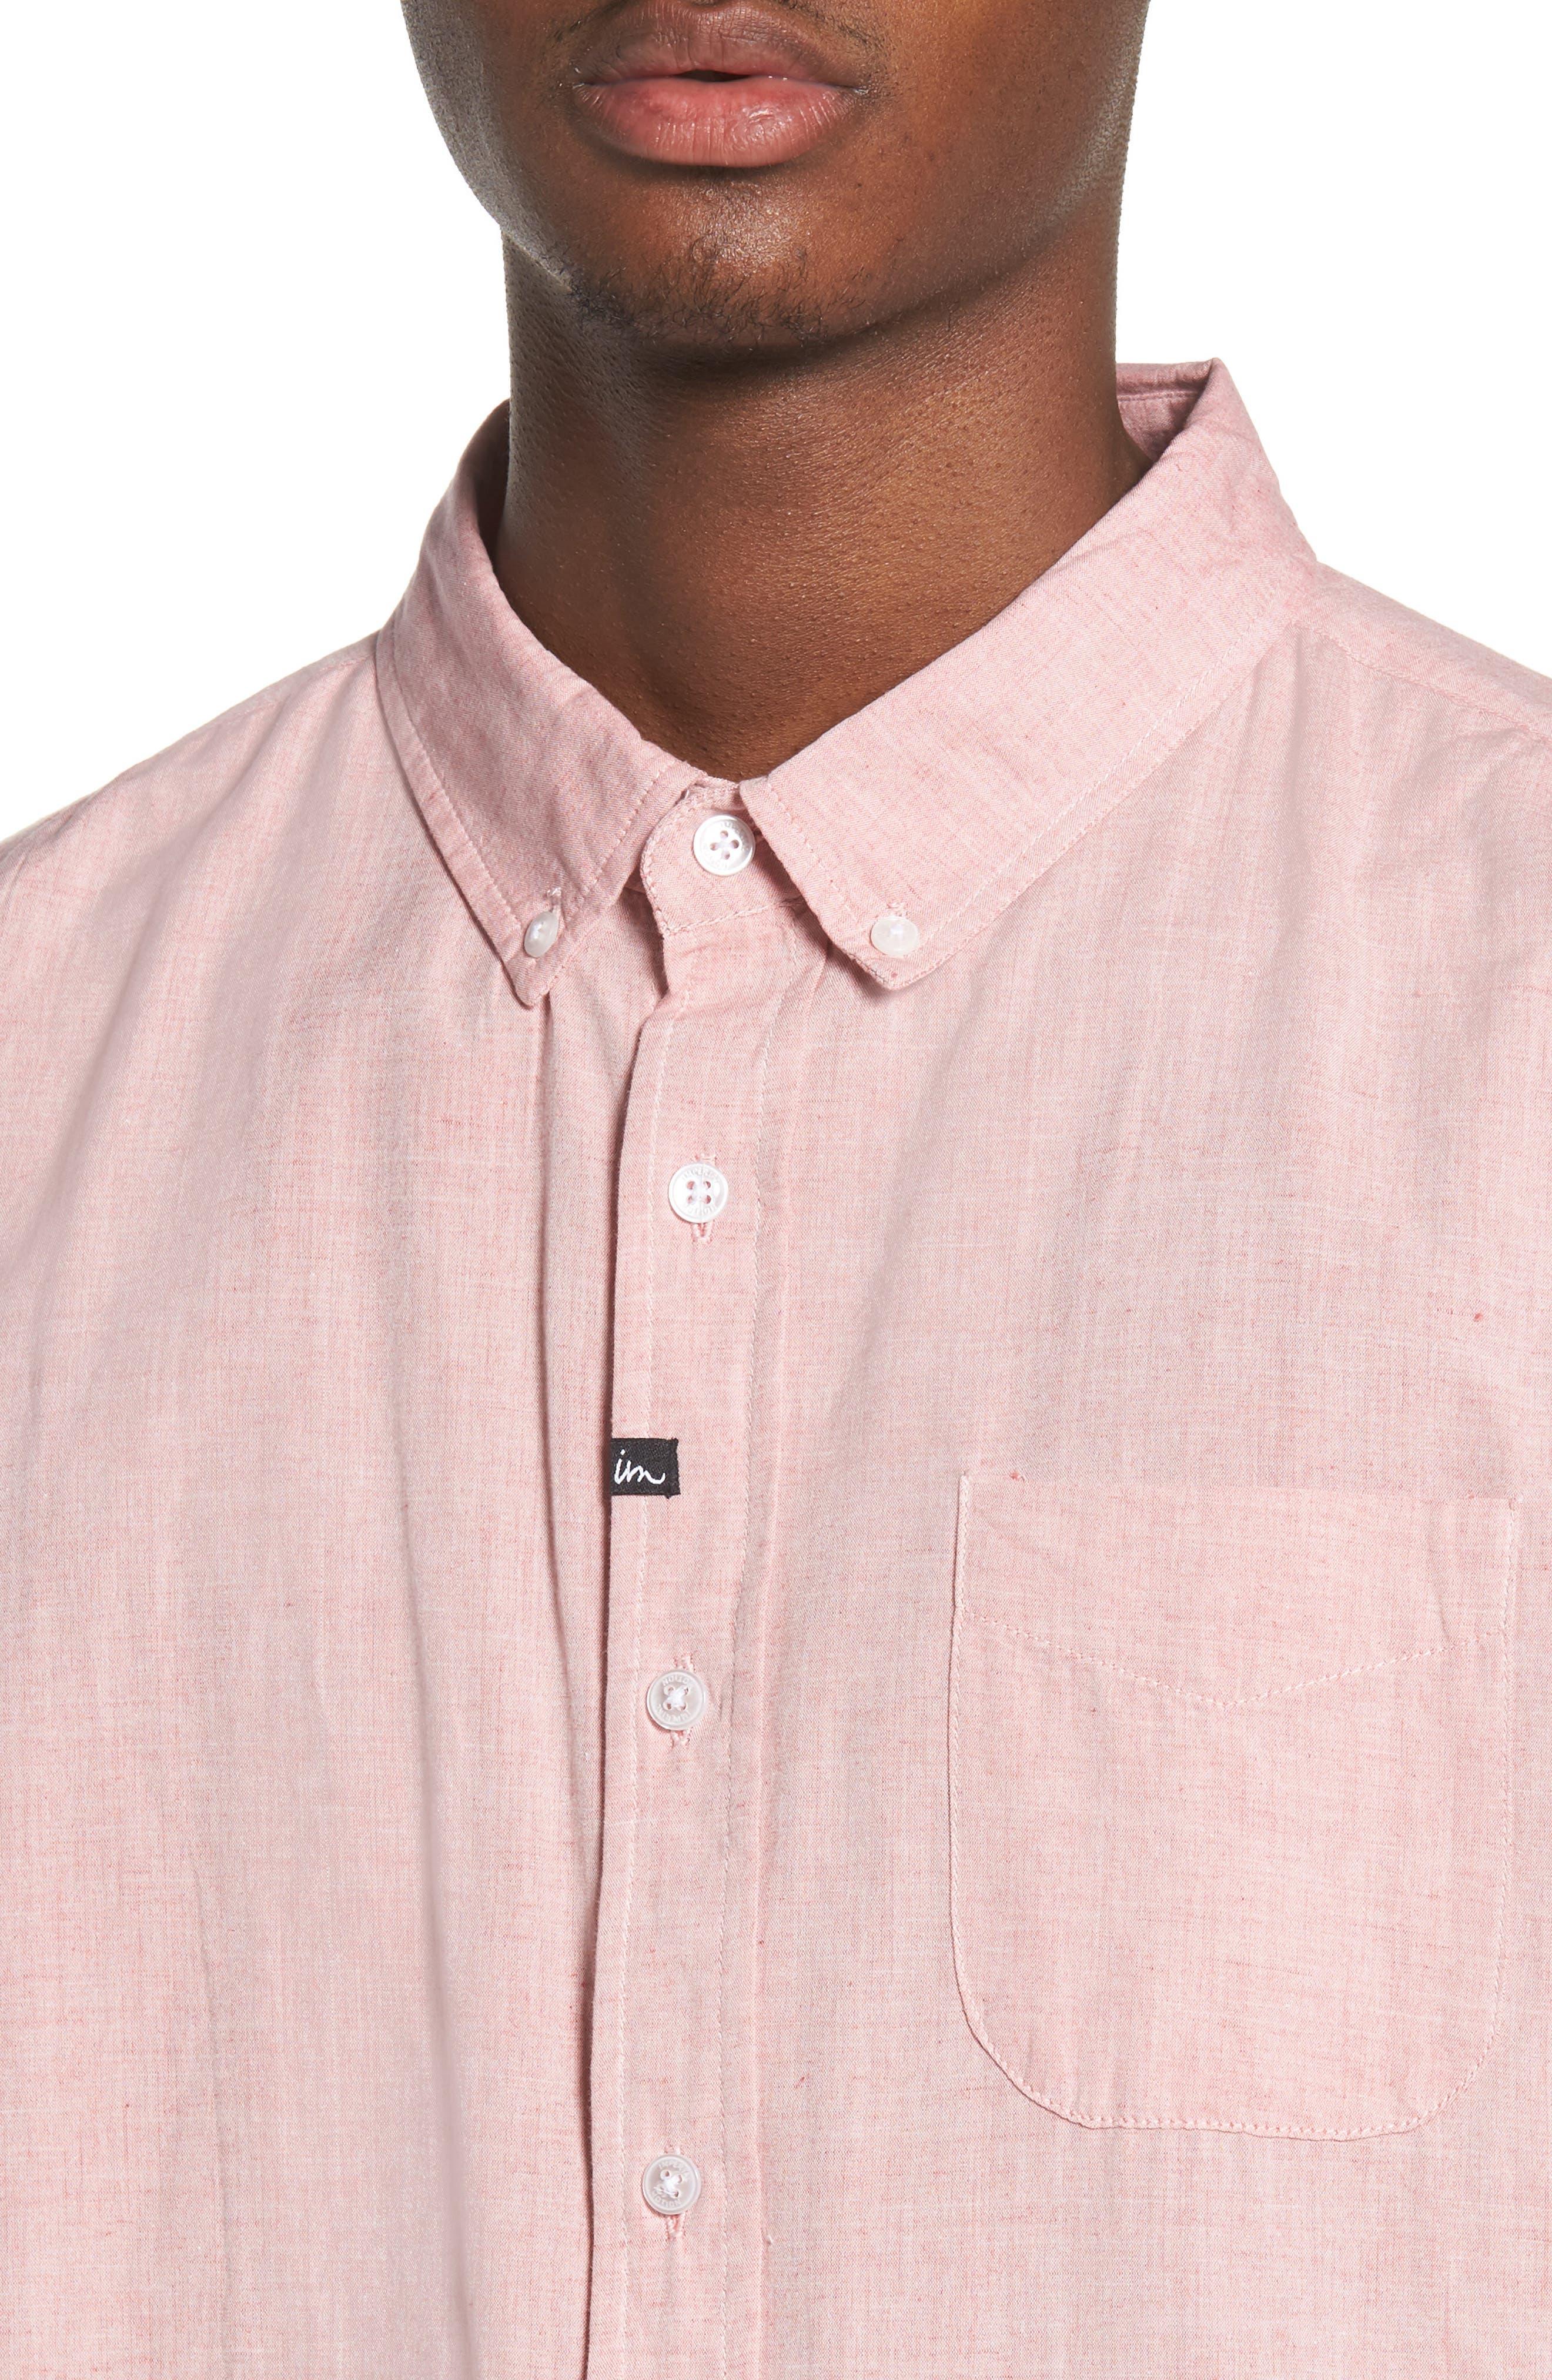 Triumph Woven Shirt,                             Alternate thumbnail 2, color,                             Mahogany